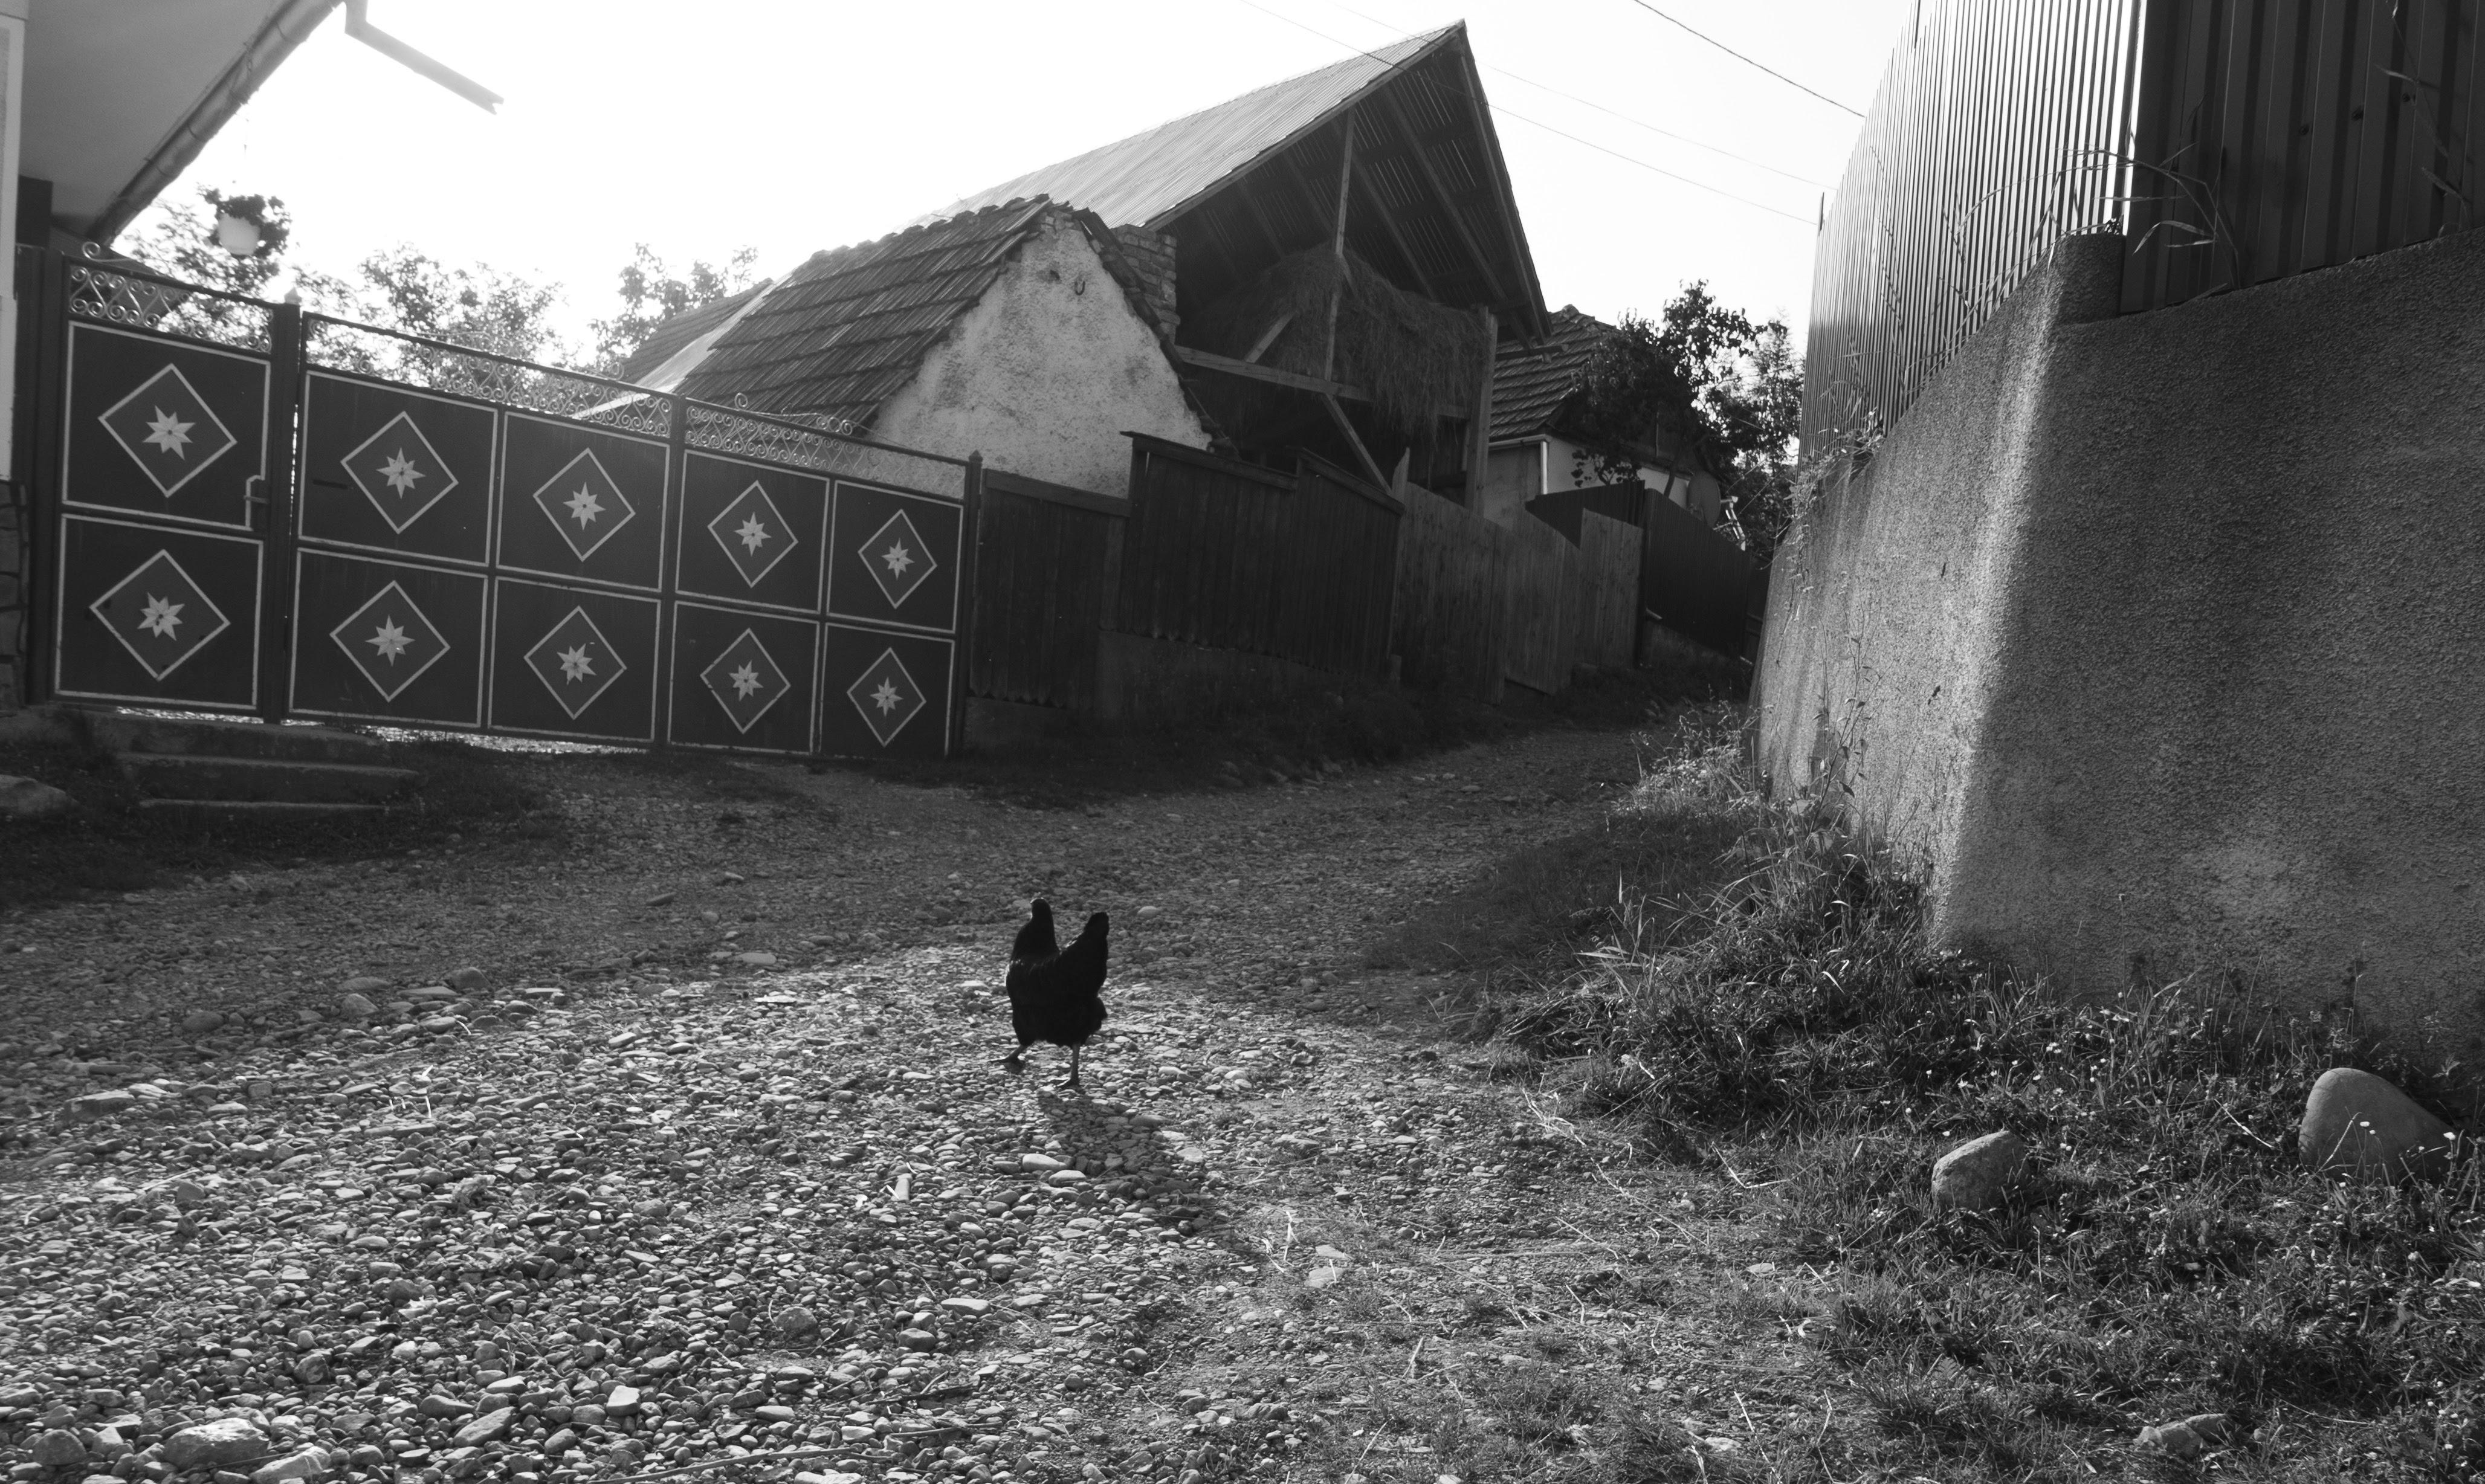 Dans les rues de Purcareni / In the streets of Purcareni